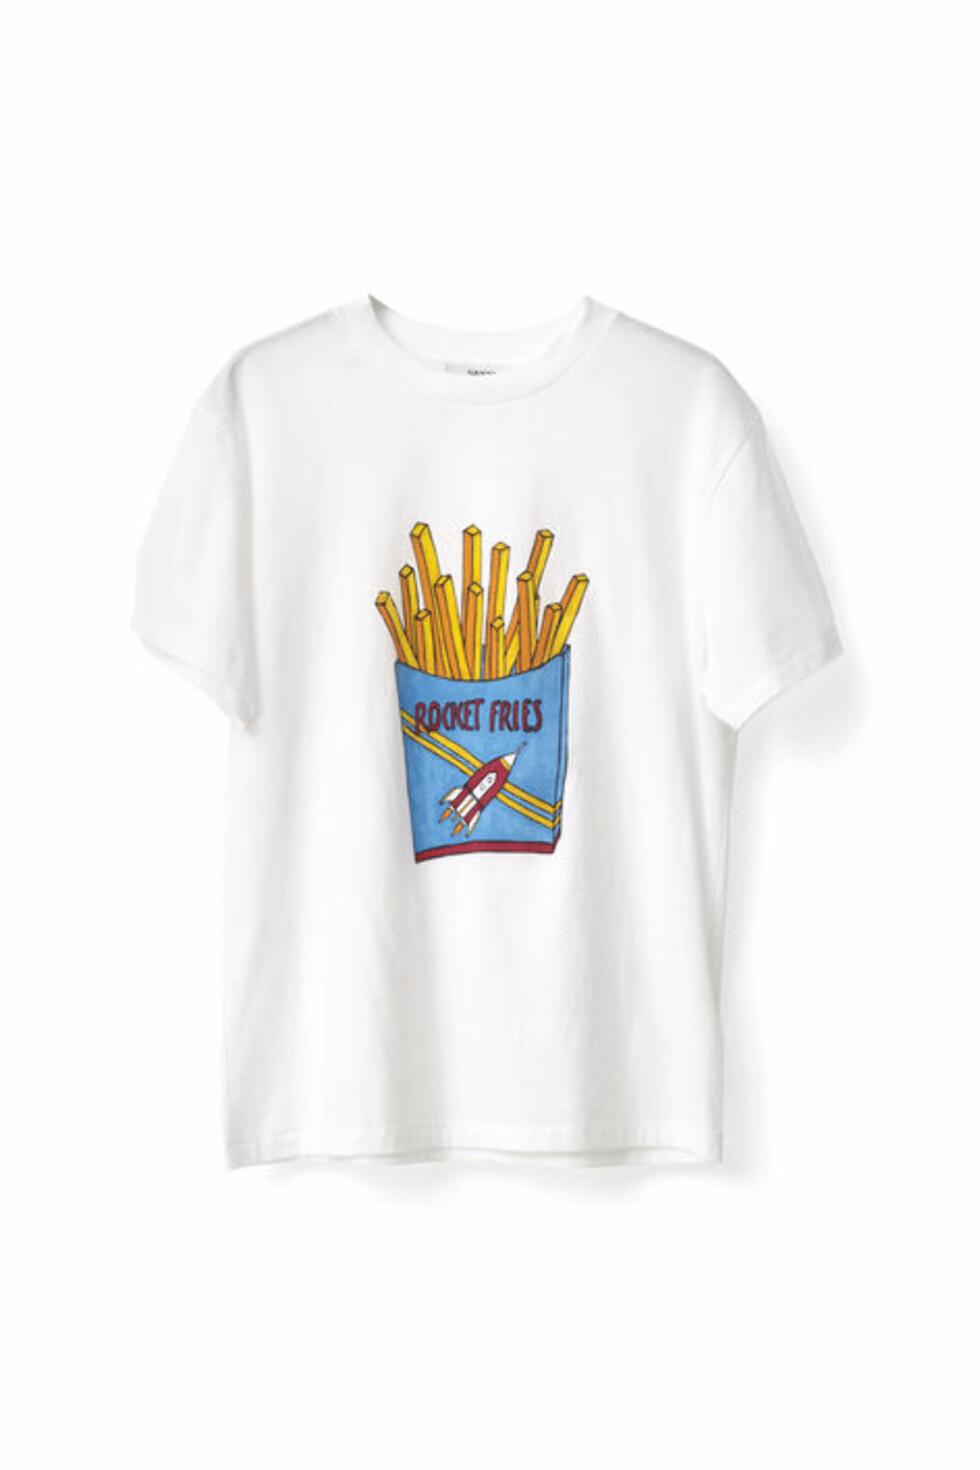 <strong>T-skjorte fra Ganni | kr 499 | http:</strong>//www.ganni.com/shop/tops-and-t-shirts/berkeley-t-shirt%2C-rocket-fries/T1707.html?dwvar_T1707_color=Bright%20White